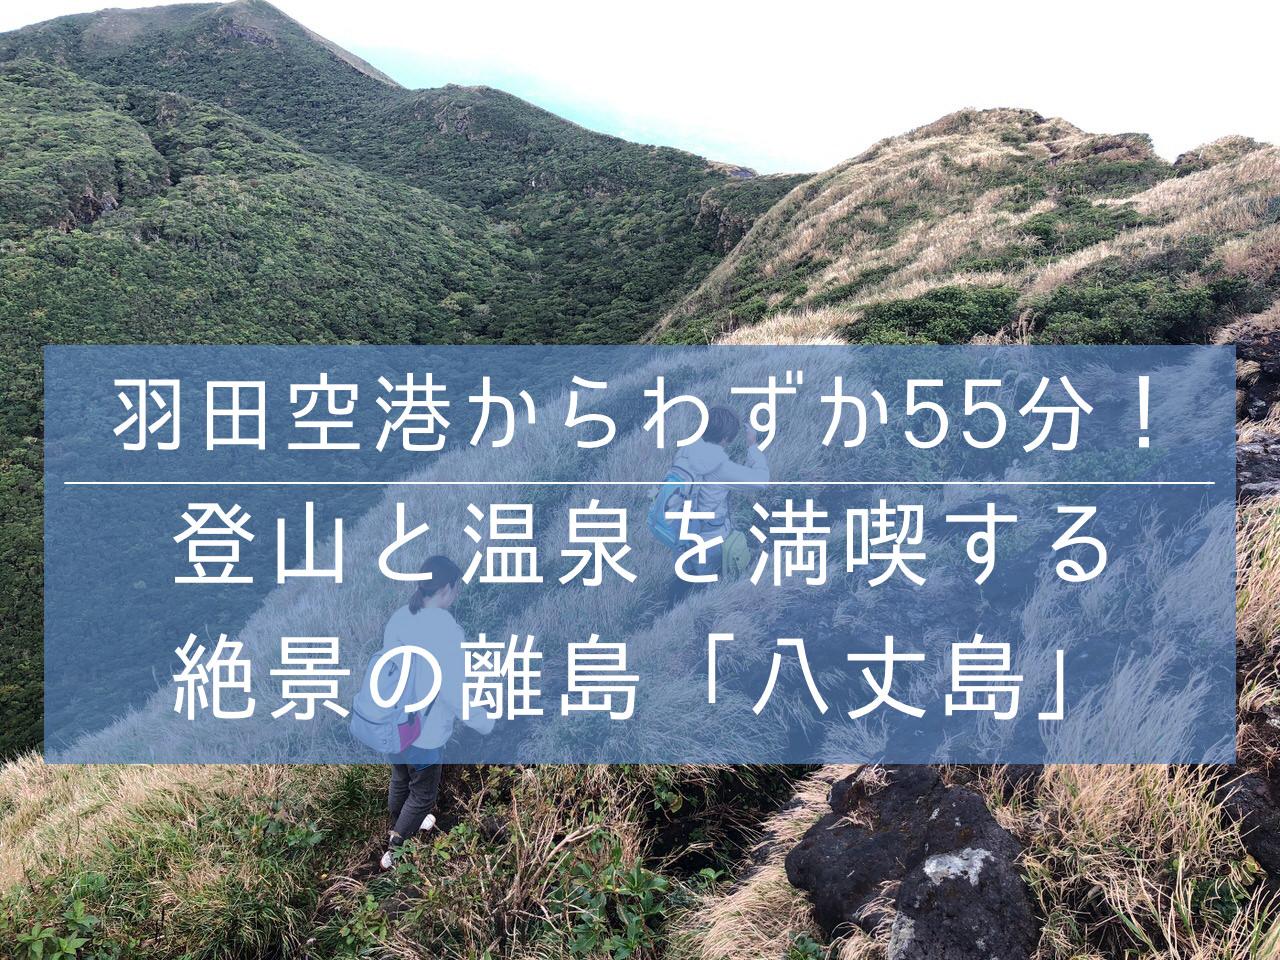 【PR】片道1時間で登れる八丈富士山頂からの絶景と「八丈島」の歴史